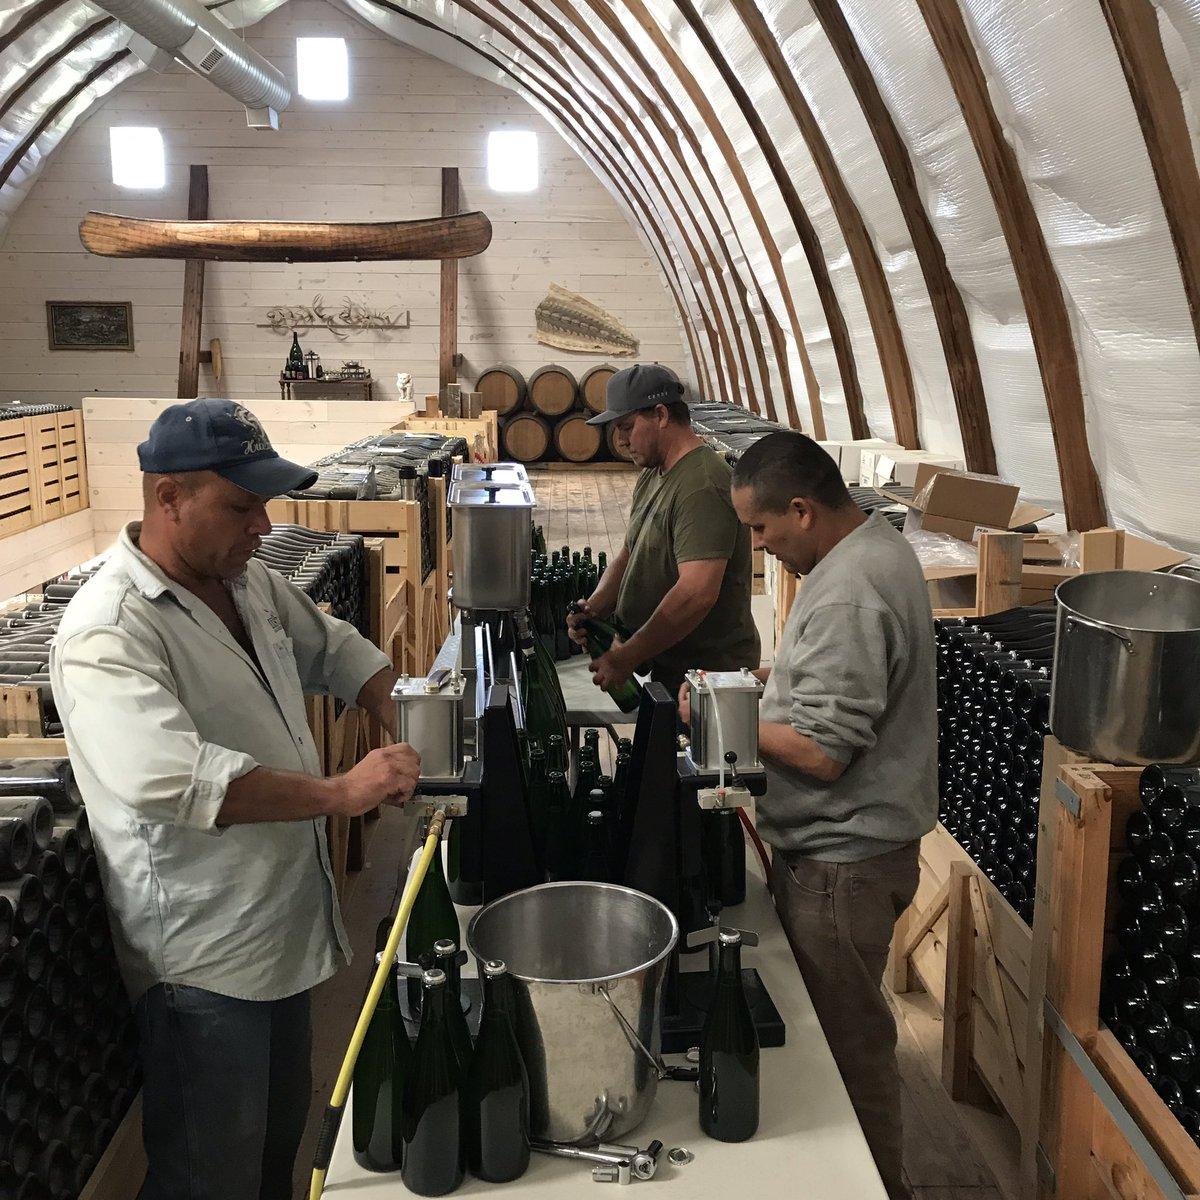 Please send good fermentation vibes our way, 2016 Les Etoiles is bottled &amp; fermenting. See you in 2020. #tirage #secondaryfermentation<br>http://pic.twitter.com/ET4QBqapZA